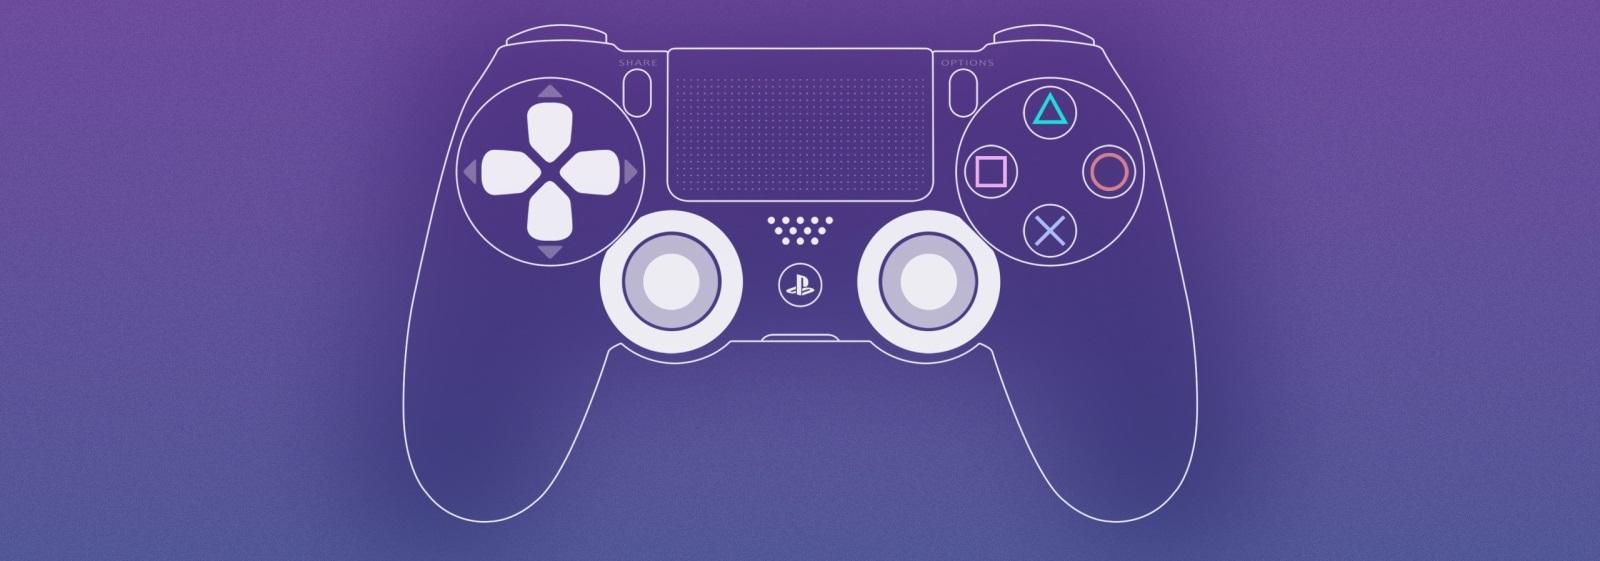 df0bfa57a PlayStation 5; screenshot: controller